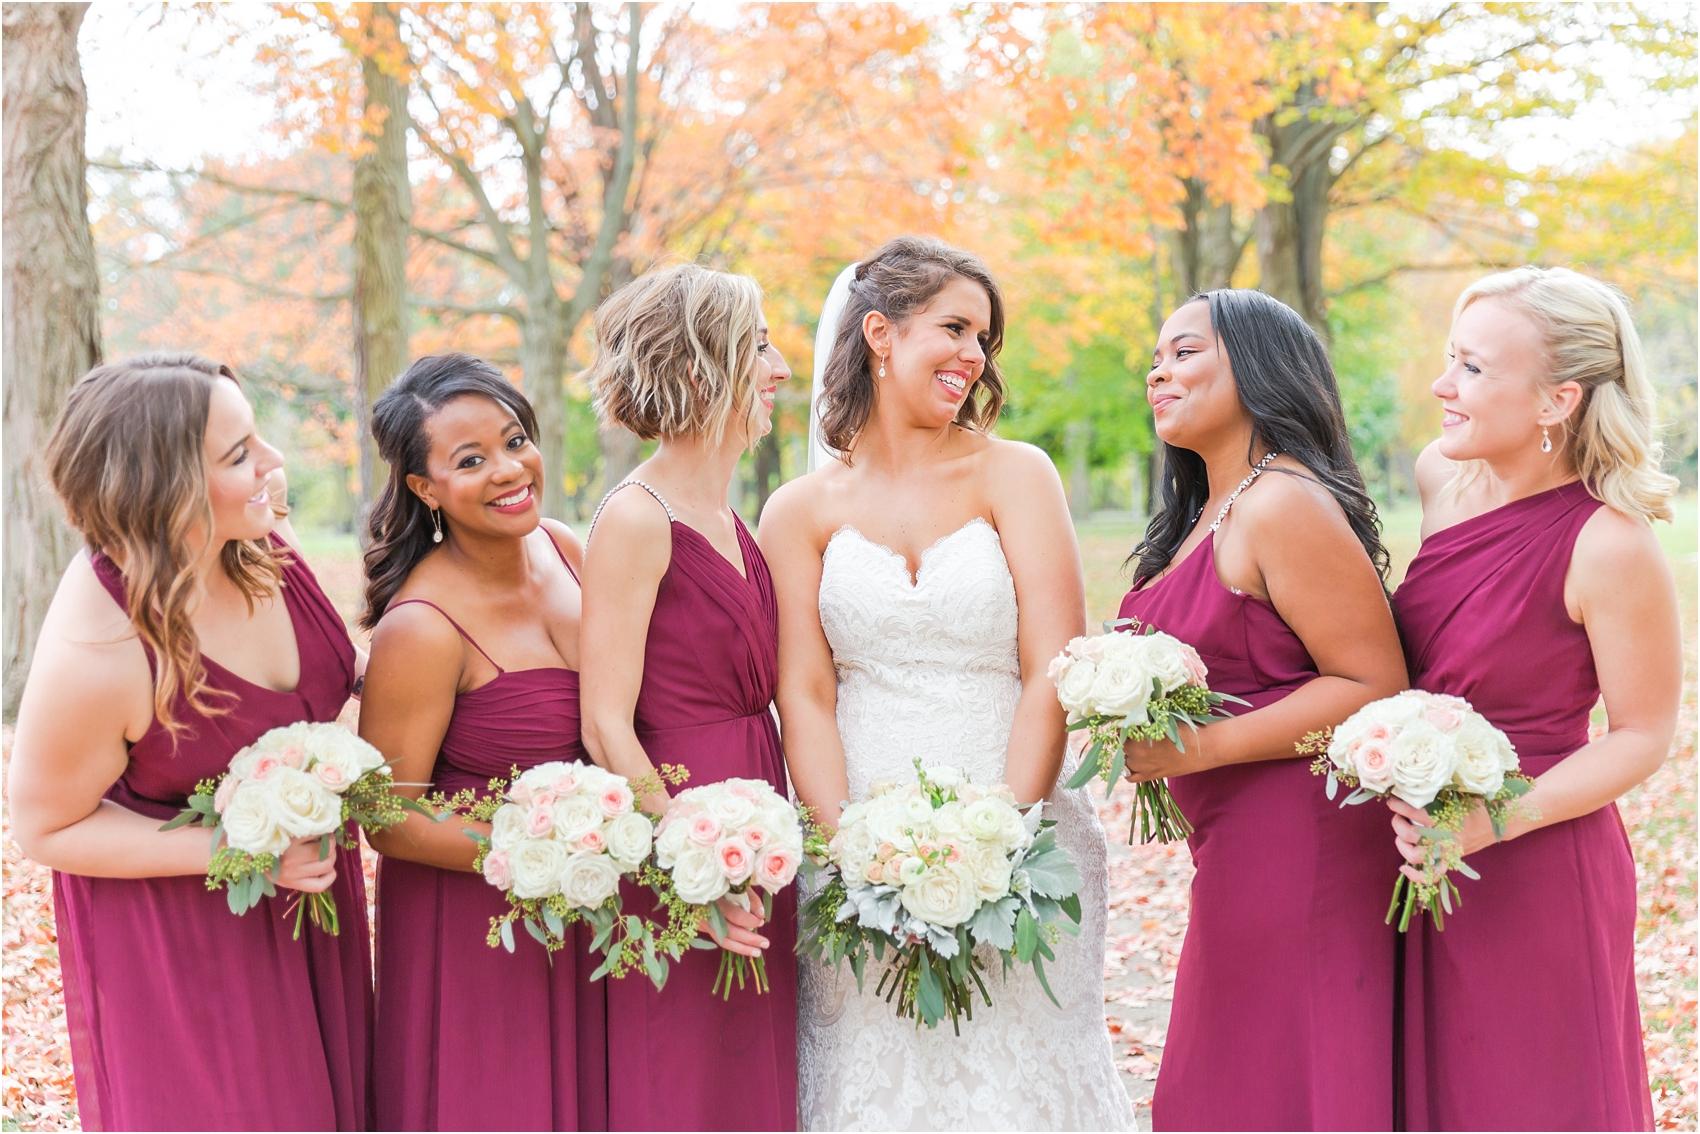 elegant-and-romantic-fall-wedding-photos-at-st-marys-catholic-church-in-monroe-michigan-by-courtney-carolyn-photography_0035.jpg